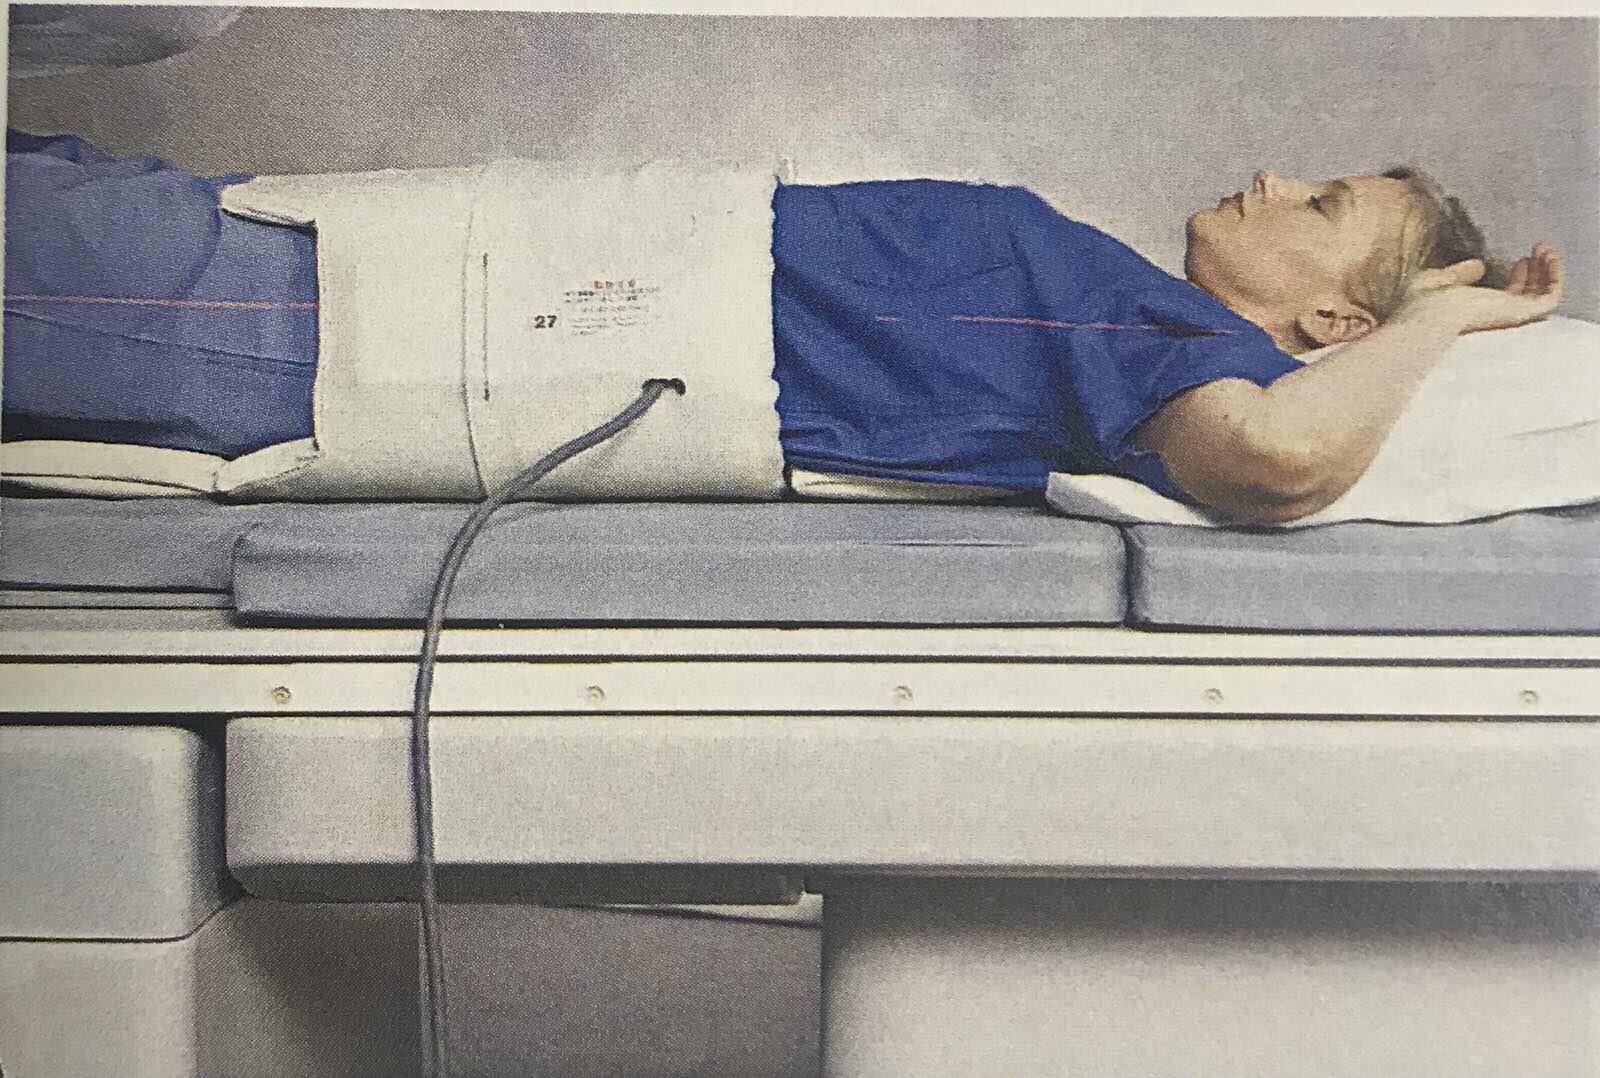 Магнитно-резонансная томография, Медицинский центр №1, фото-4